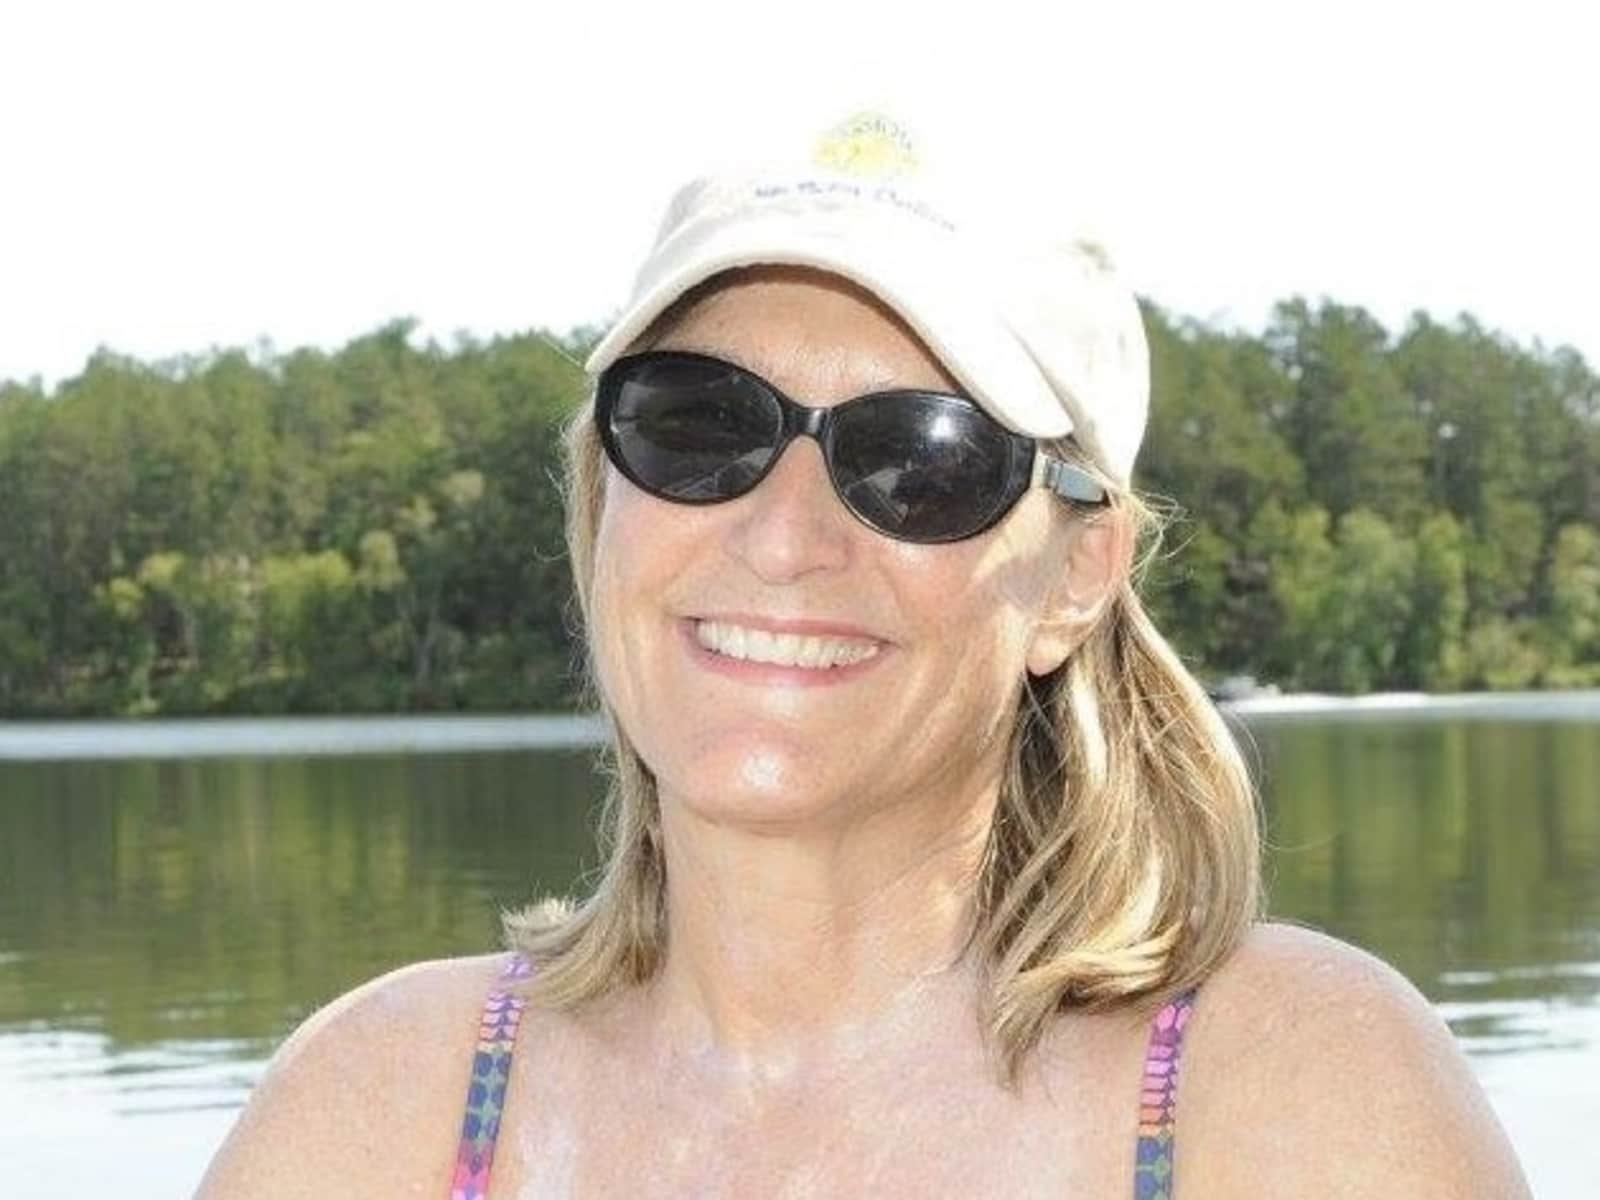 Laura from Fairfax, Virginia, United States